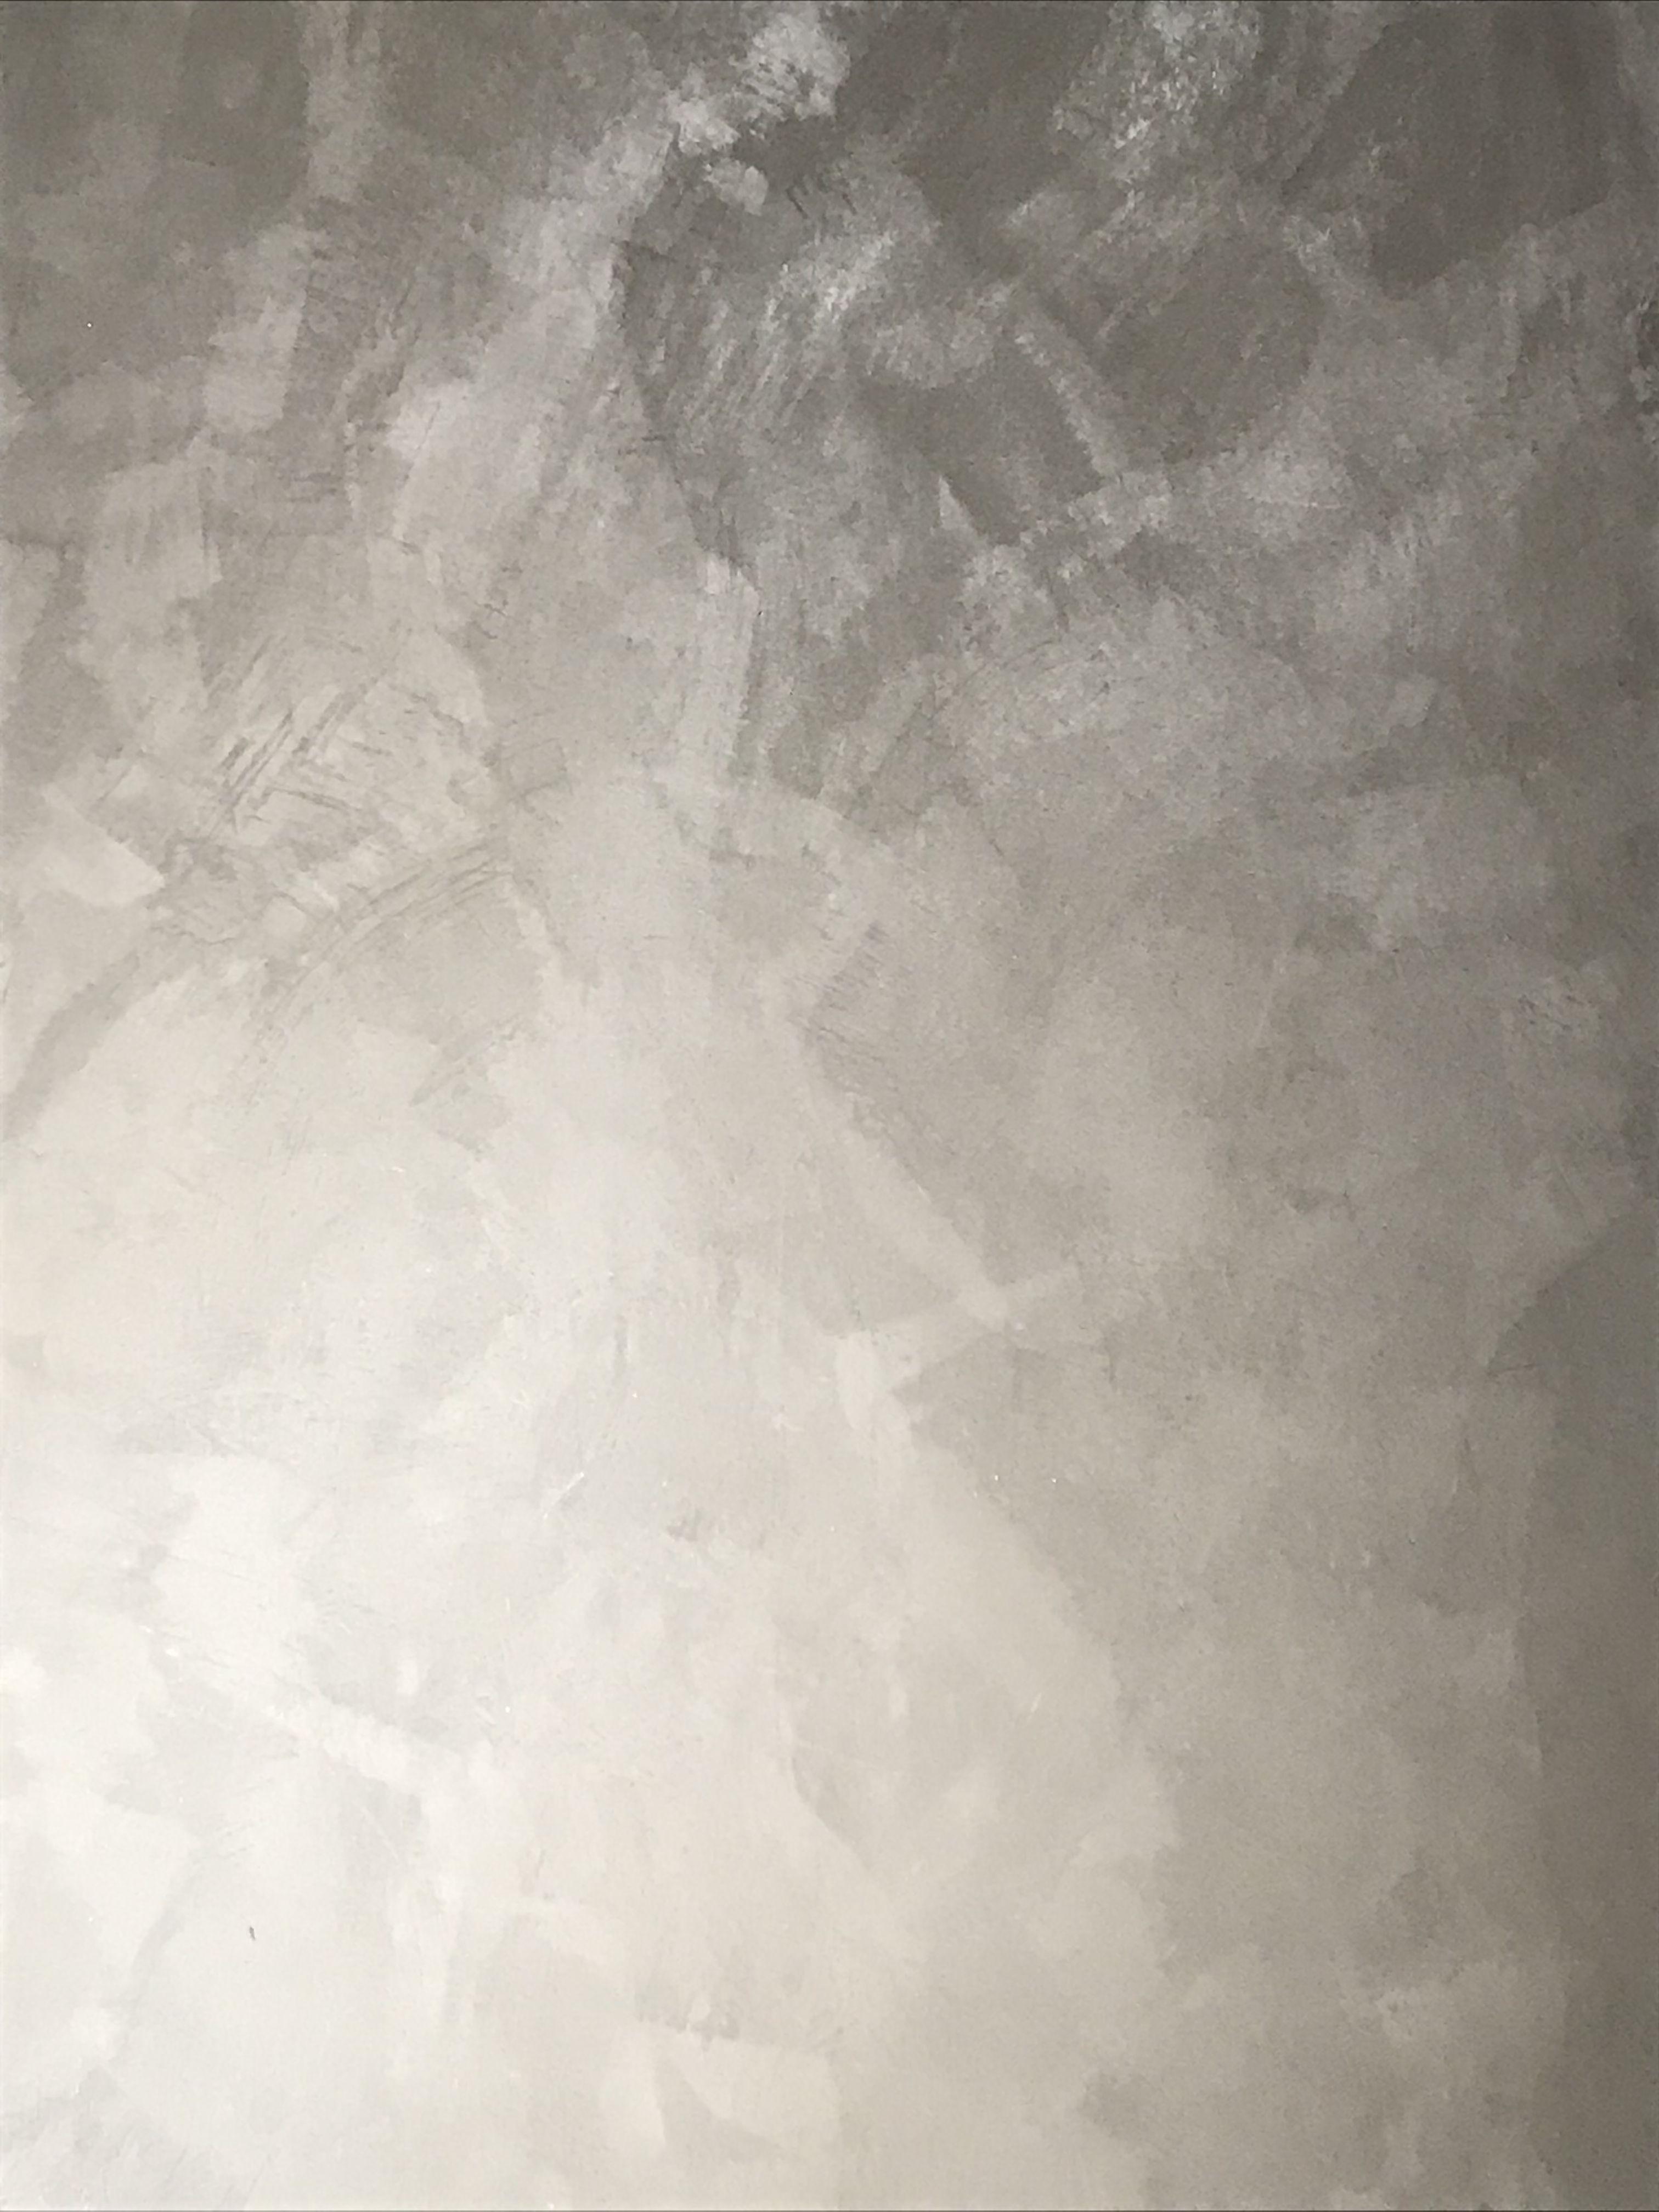 Liscio Concrete Wall In 2020 Painting Concrete Concrete Wall Concrete Decor